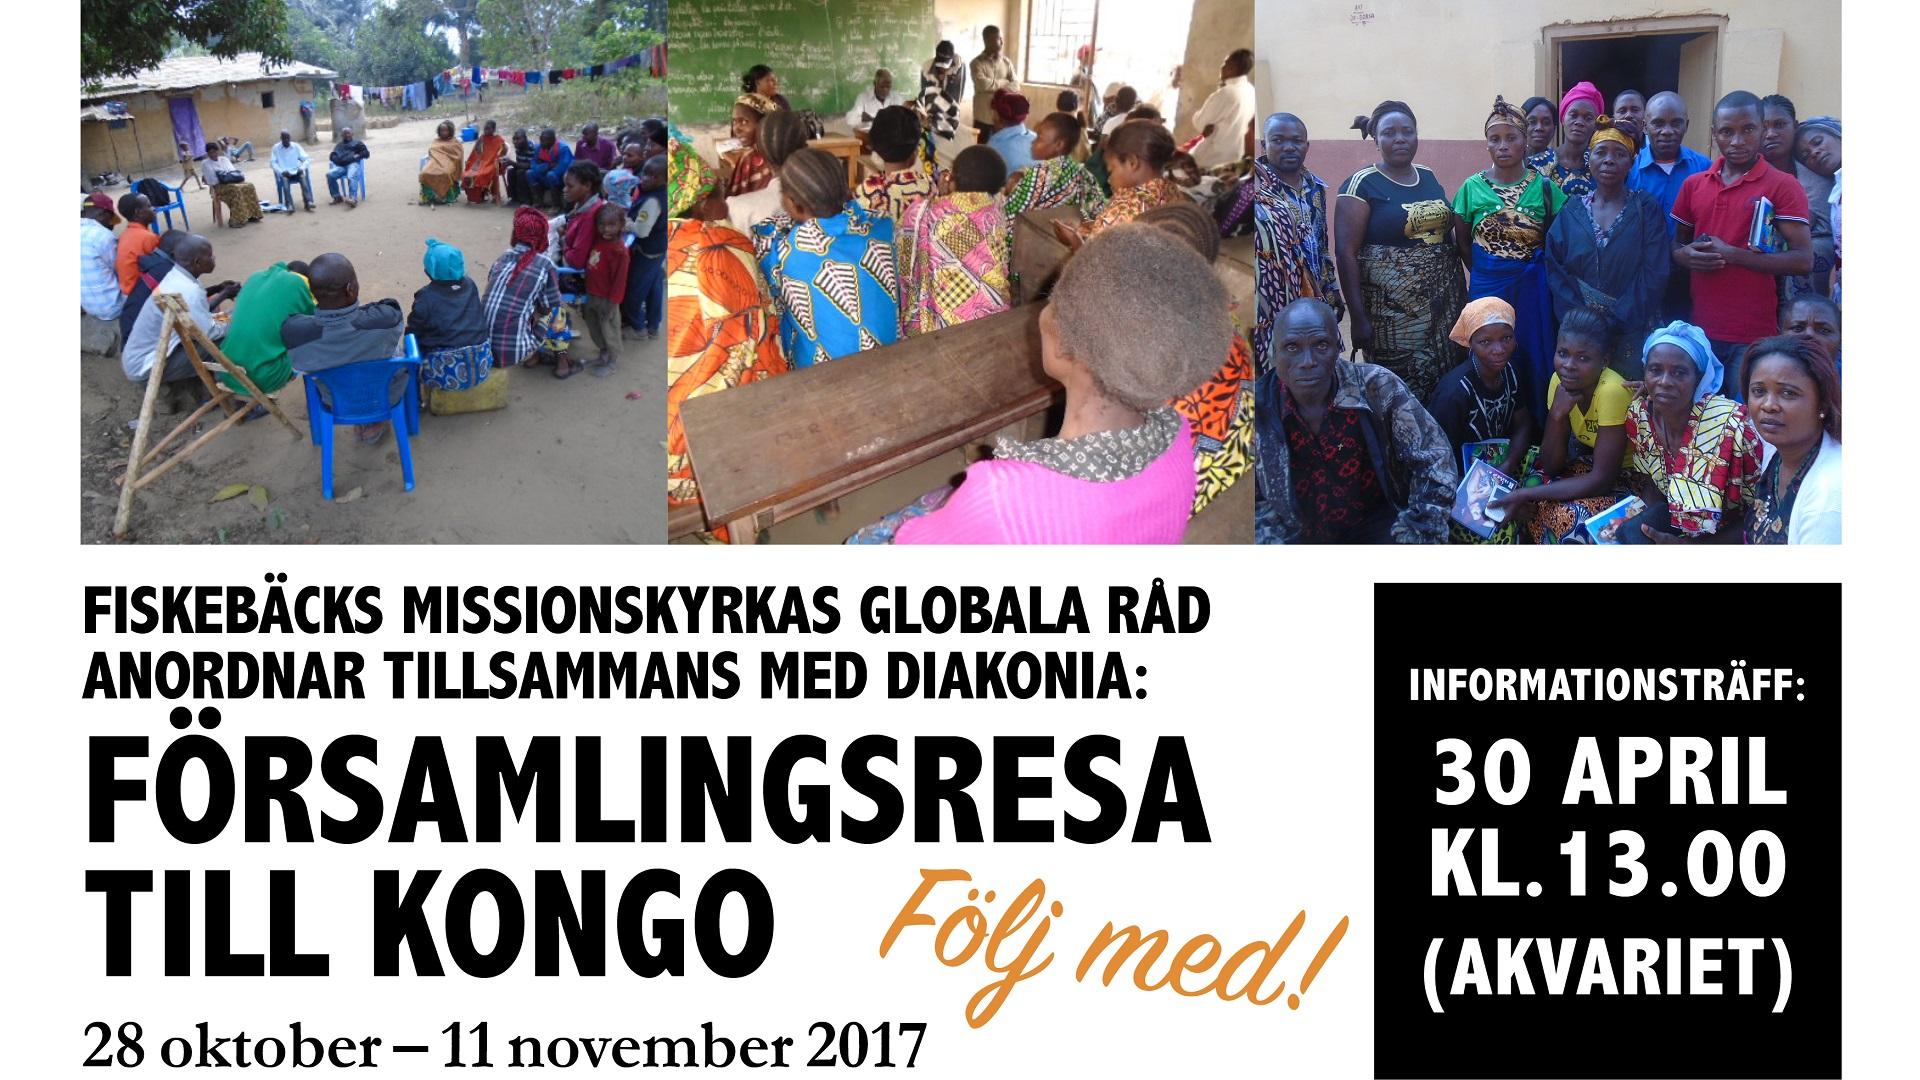 Resa_till_Kongo_PP_1080